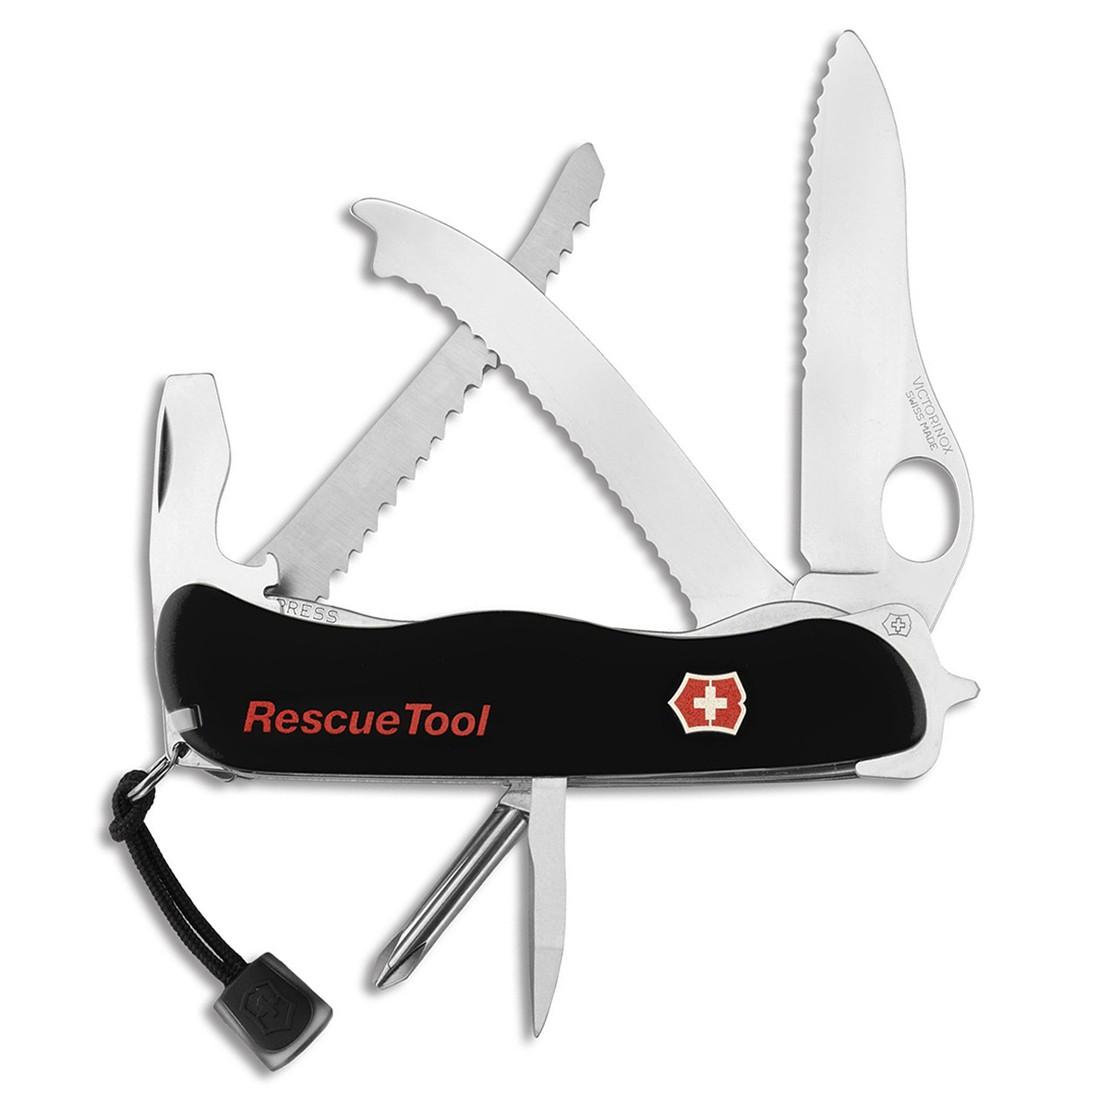 Canivete Victorinox Rescuetool preto com bainha 12.2 cm 0.8623.MWN.3R